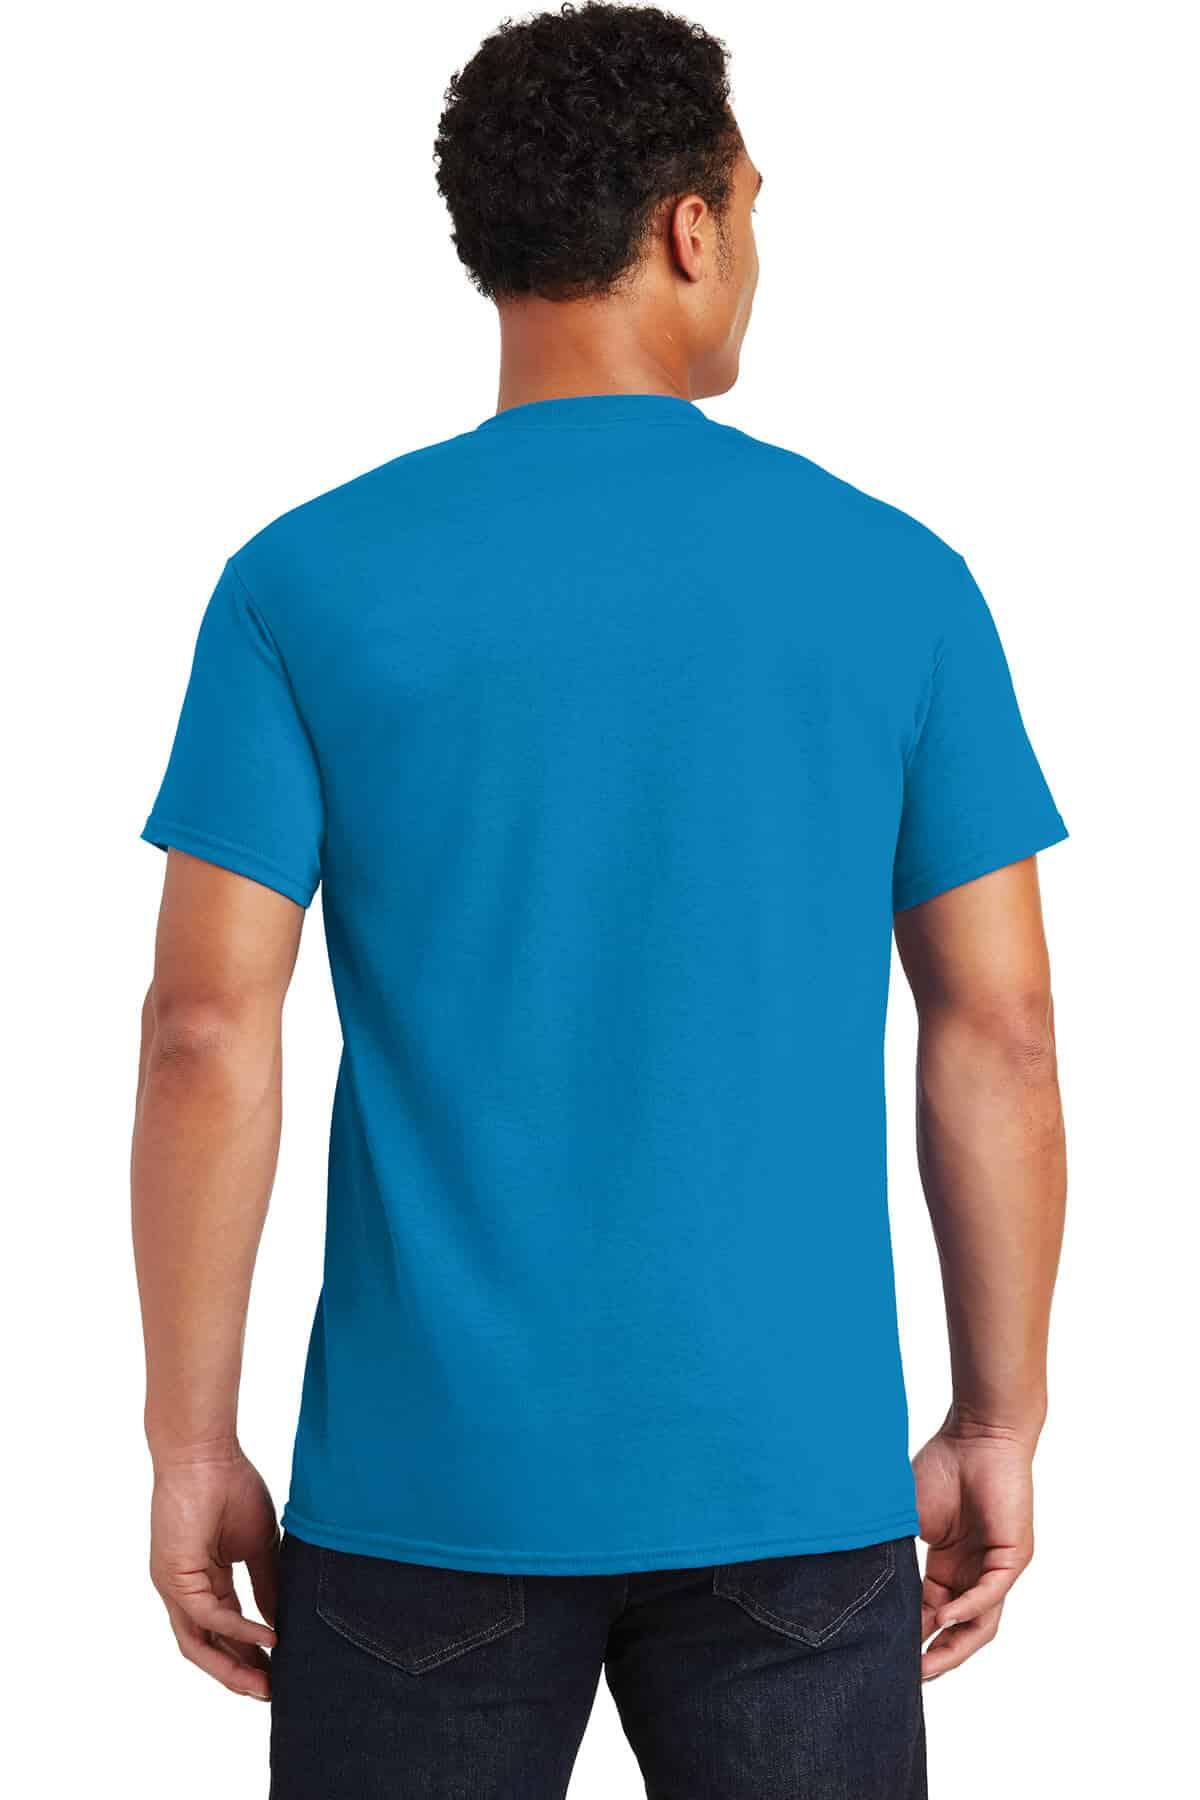 Sapphire TeeShirt Back